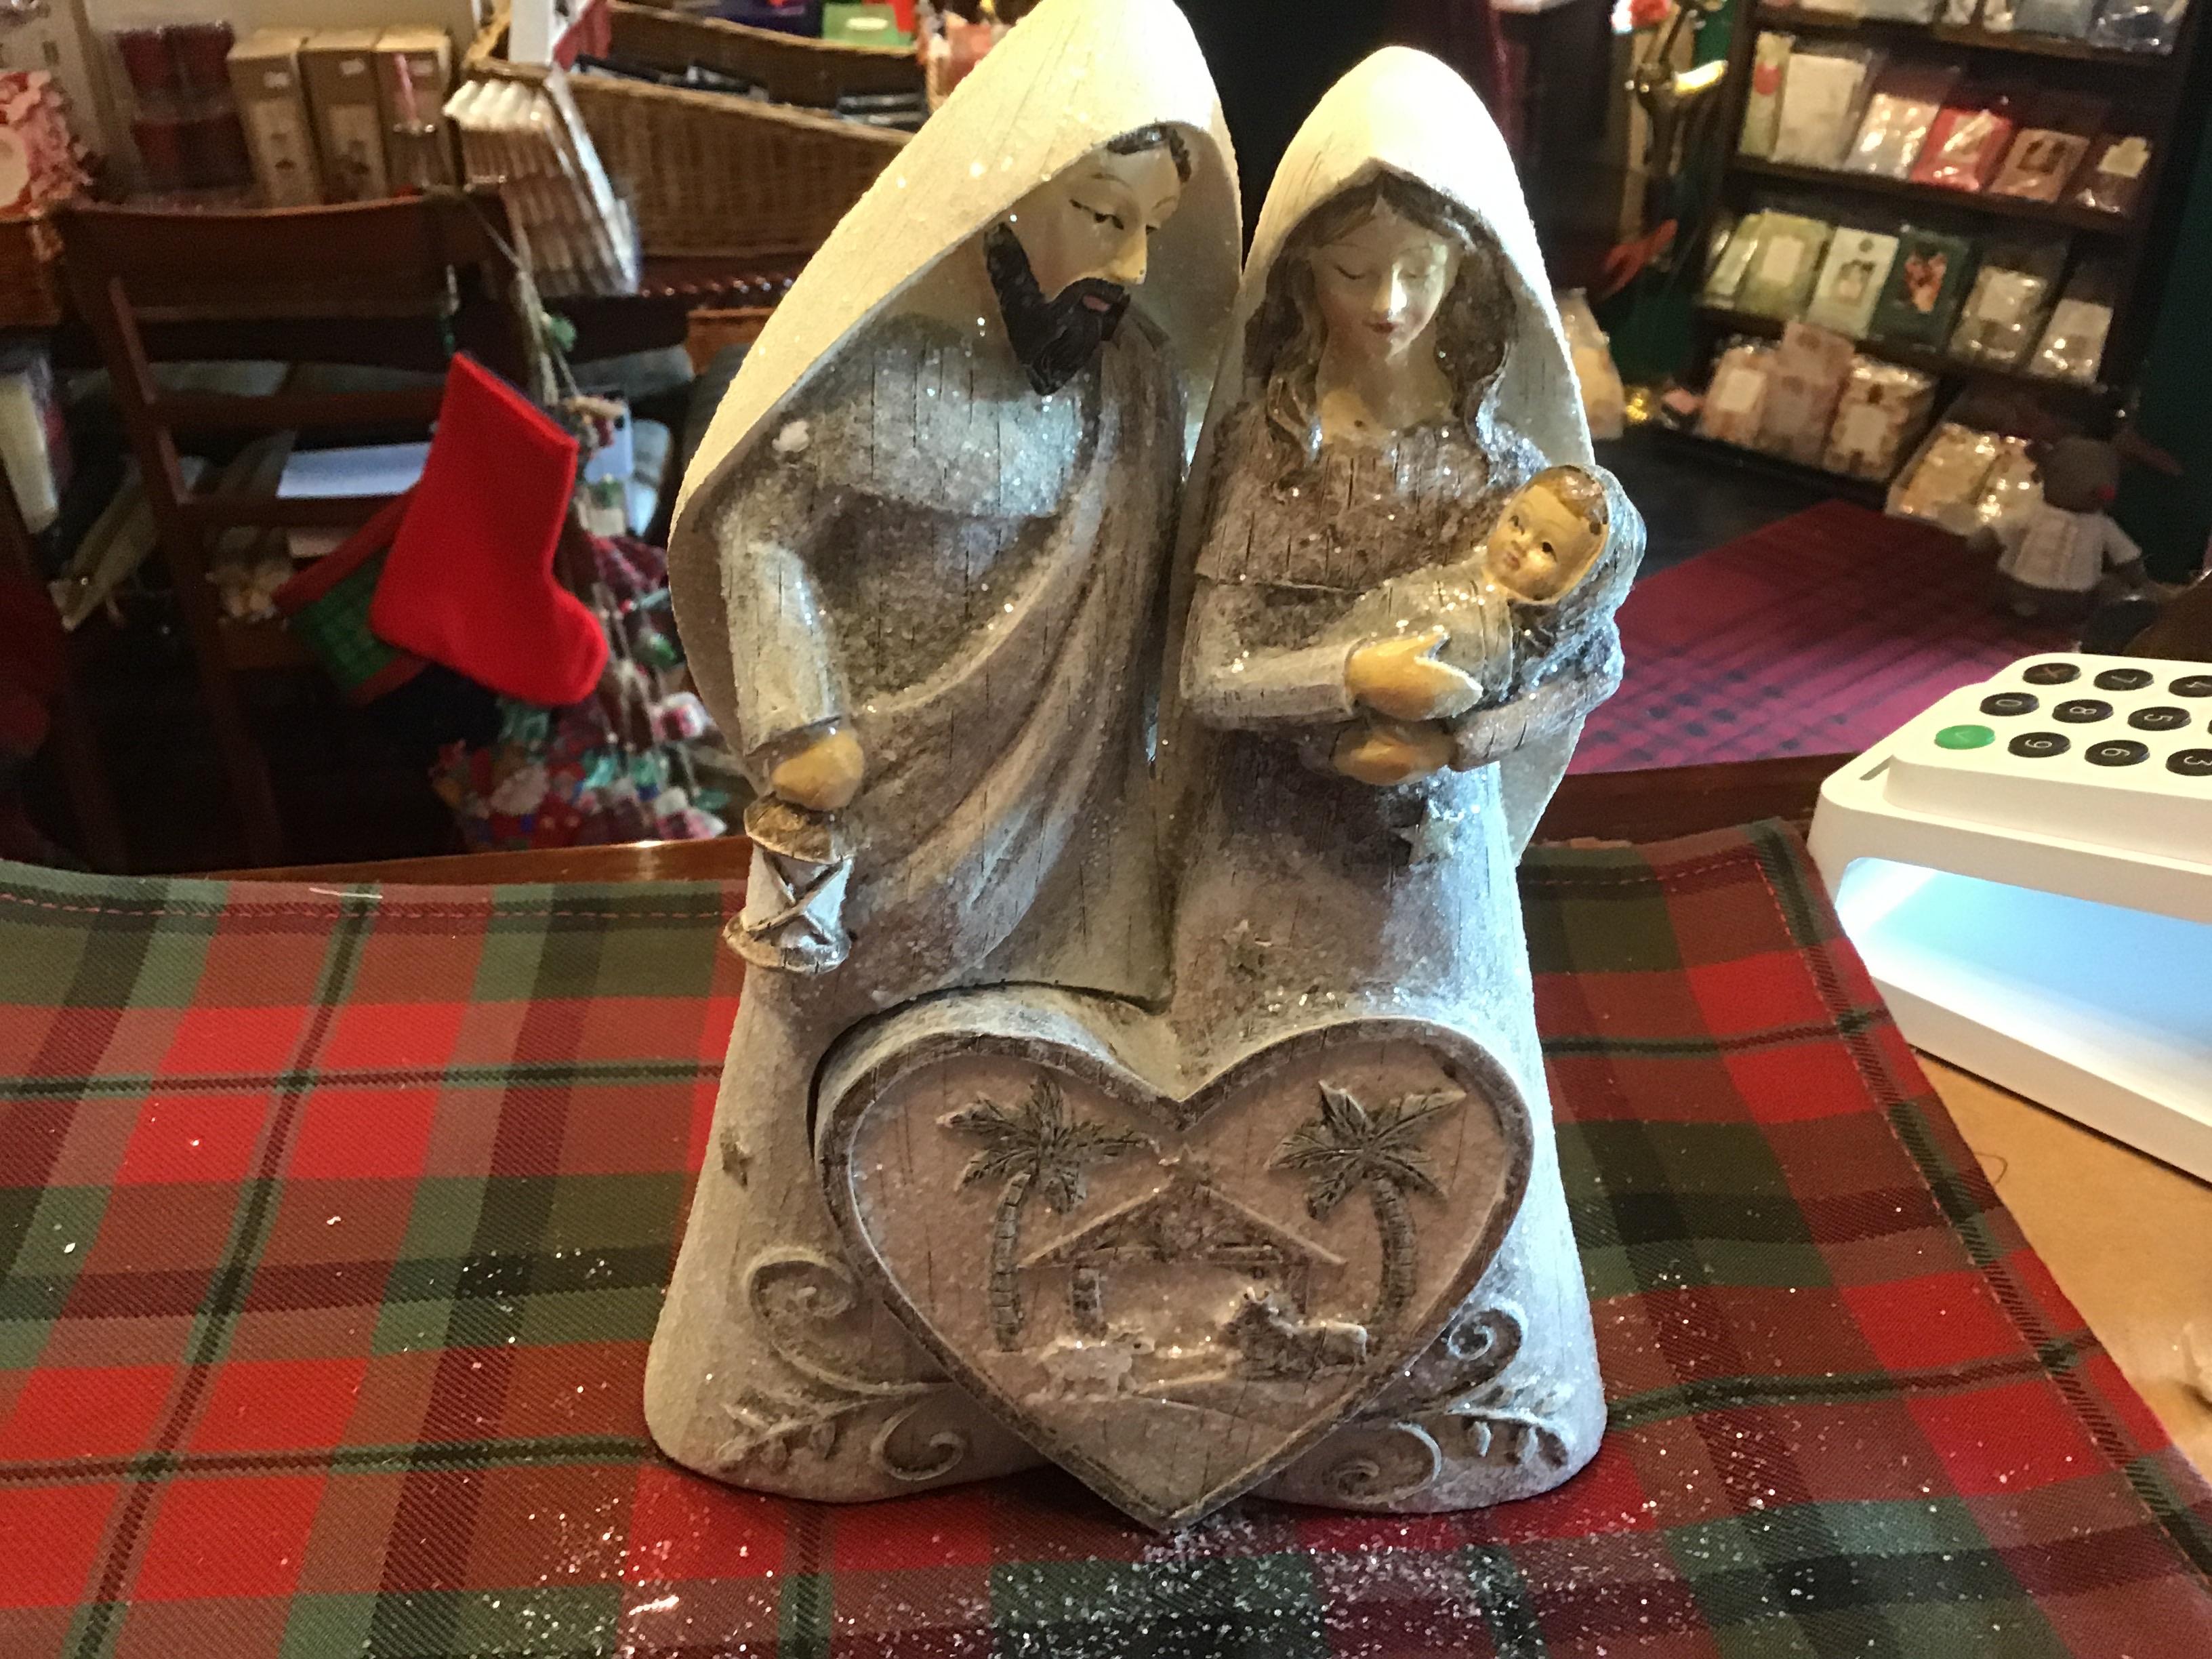 Love silver nativity